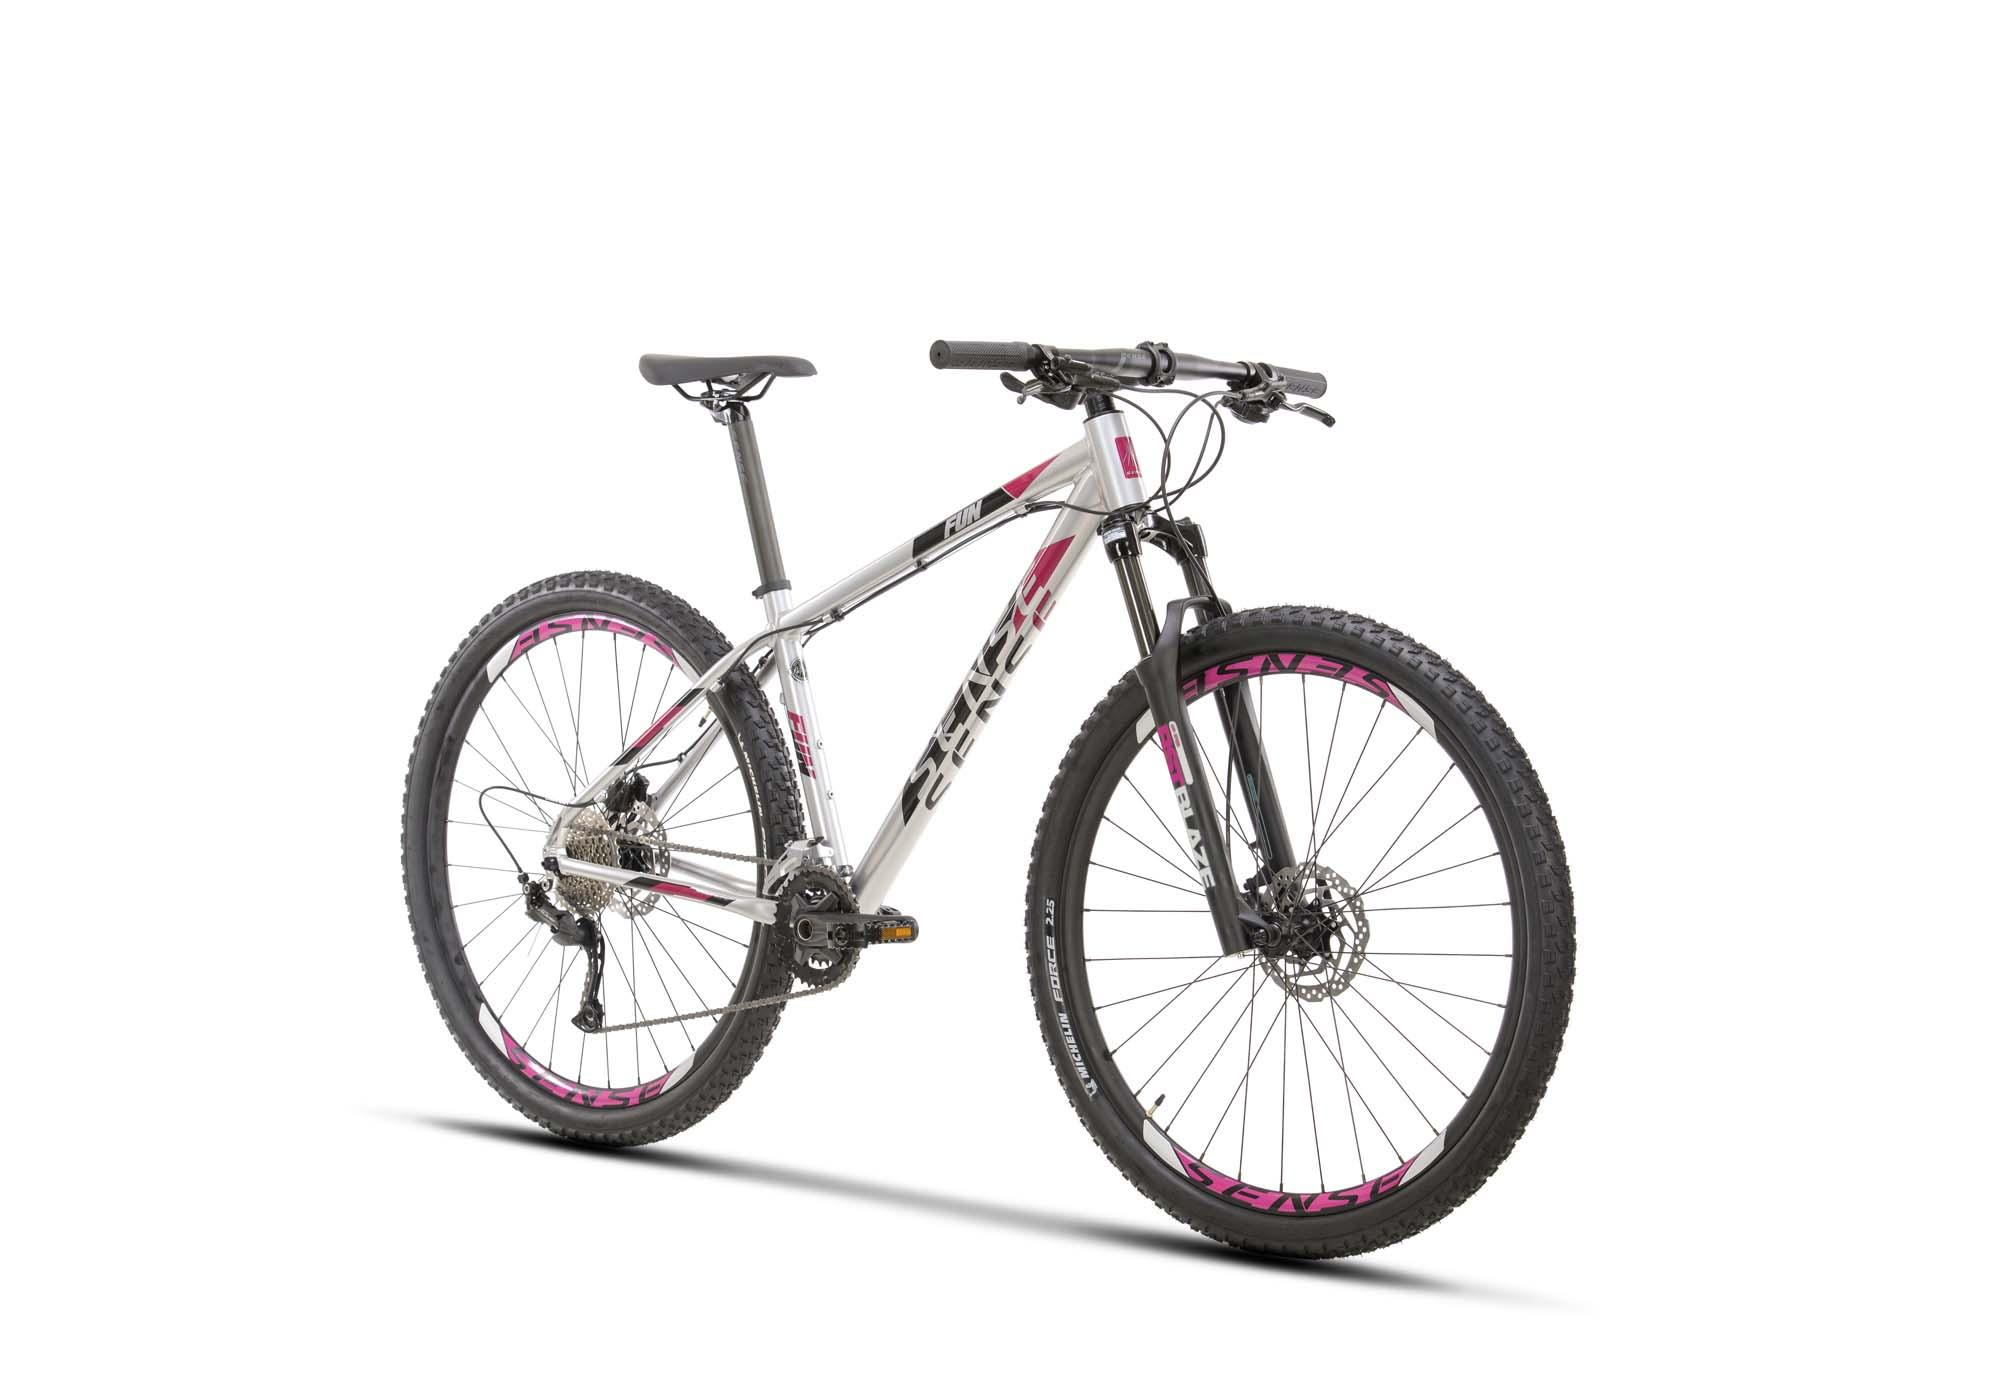 BICICLETA FUN EVO 2021/22 ALUM/ROXO TAM M